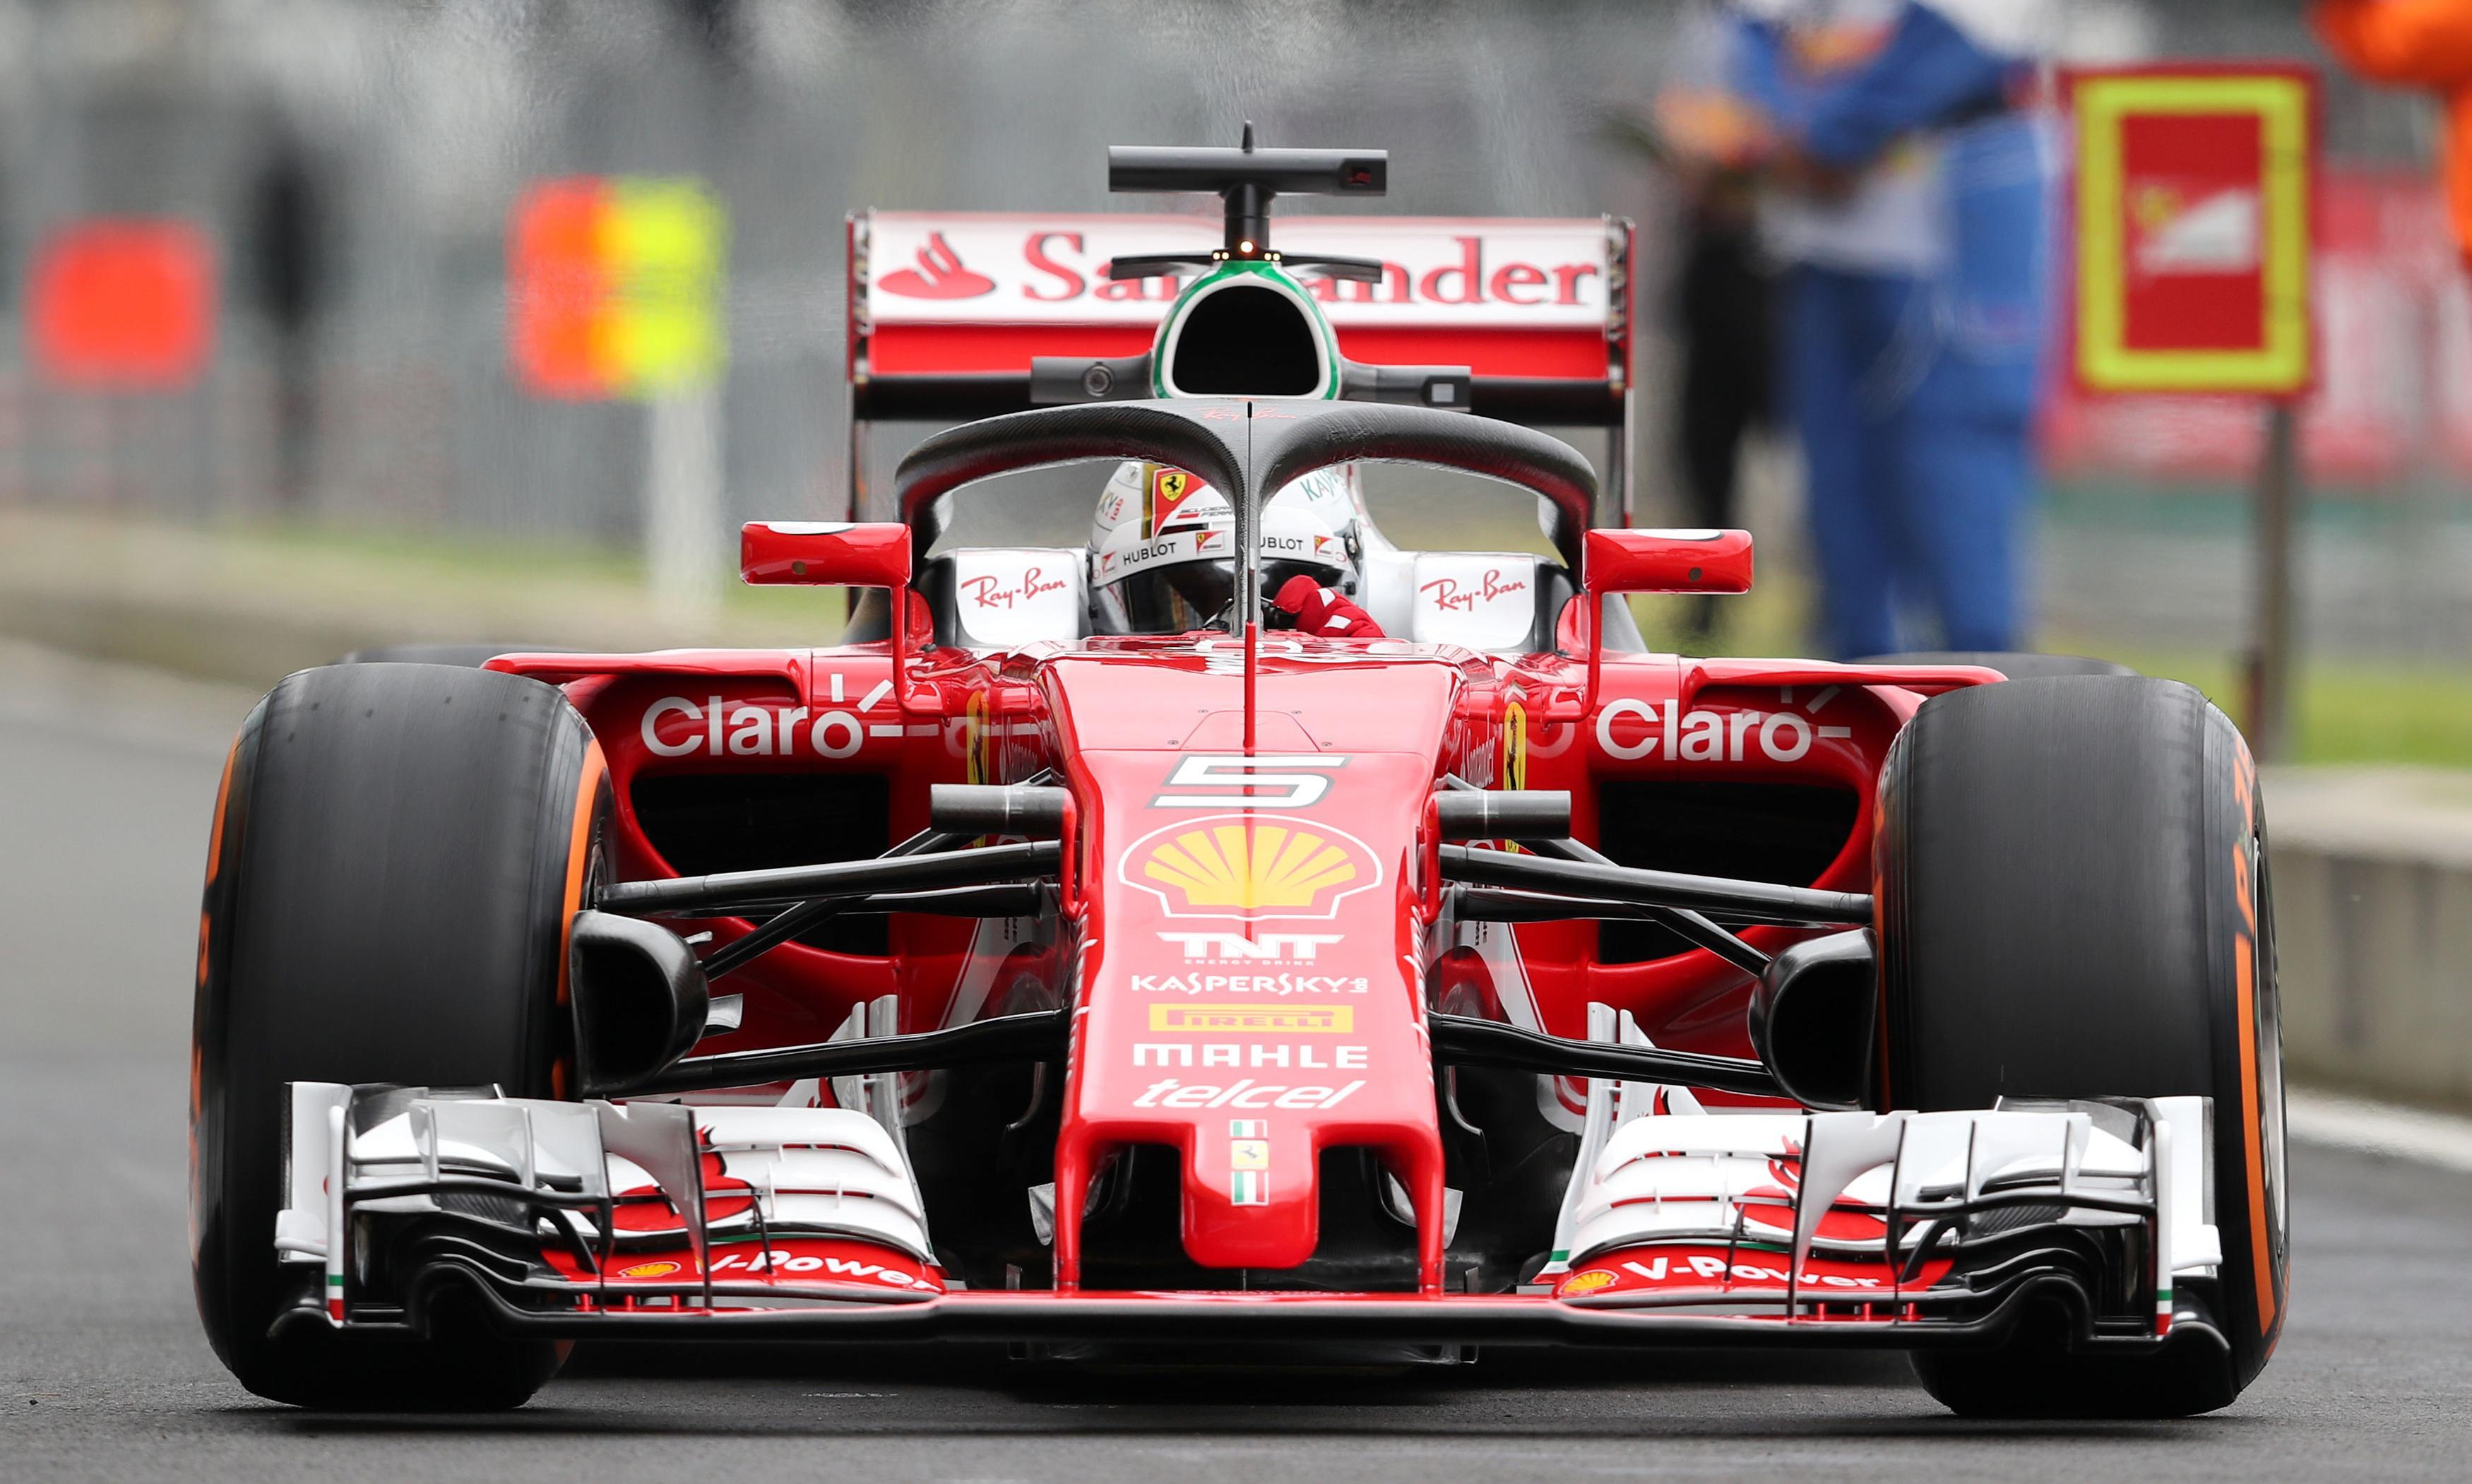 F1 split after Bernie Ecclestone vetoes halo safety device